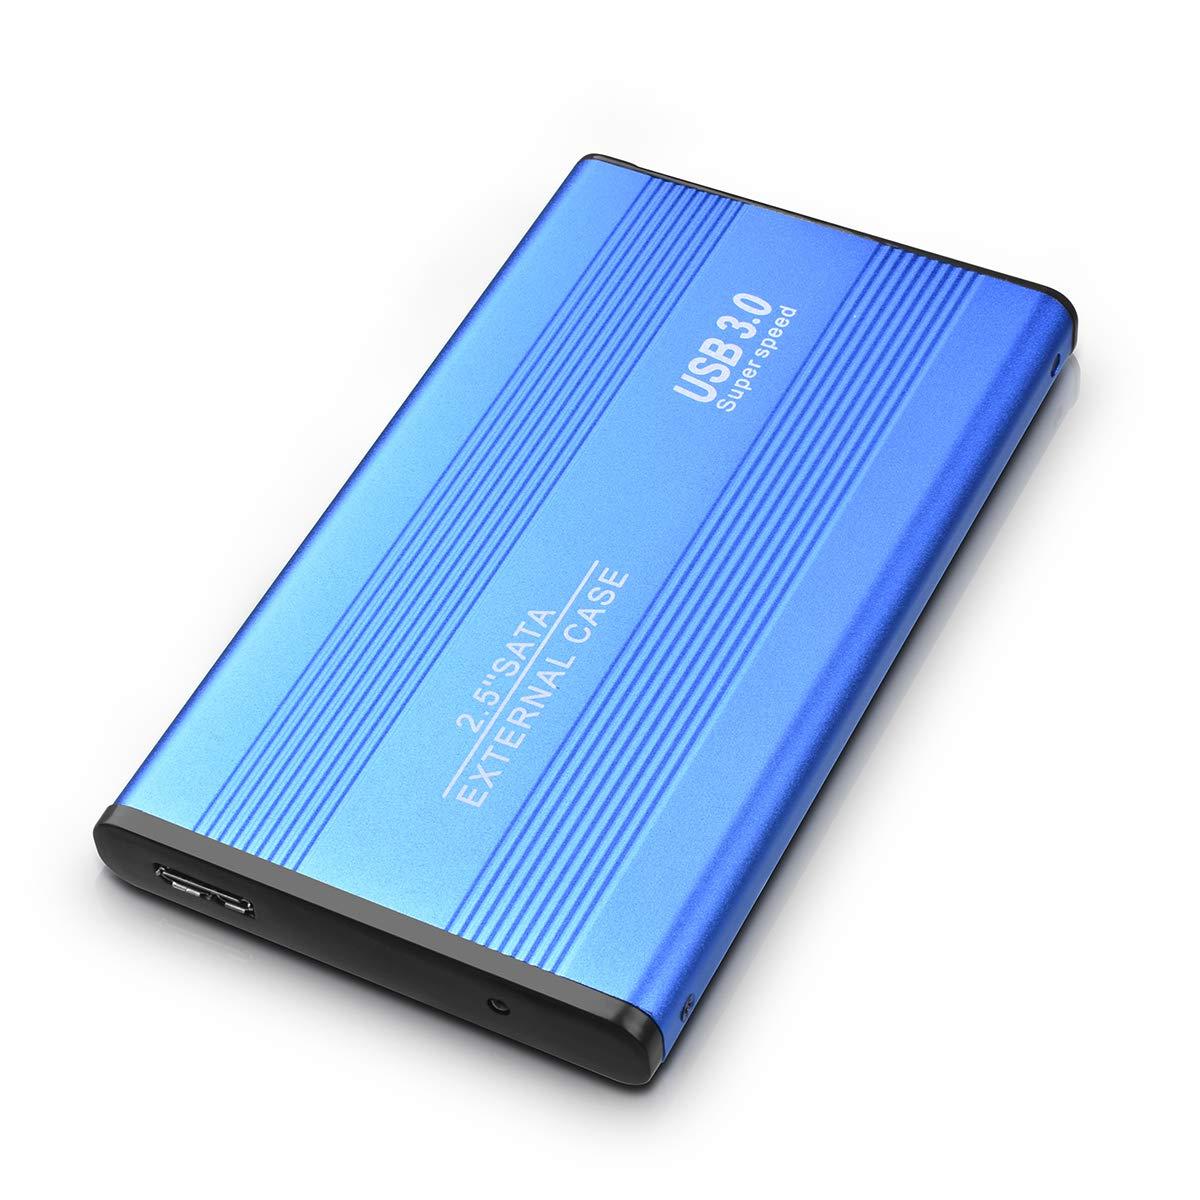 Maidix Disco Duro Externo 2tb USB 3.0 Disco Duro Externo para Mac Chromebook PC Xbox PS4,MacBook 2tb, Negro